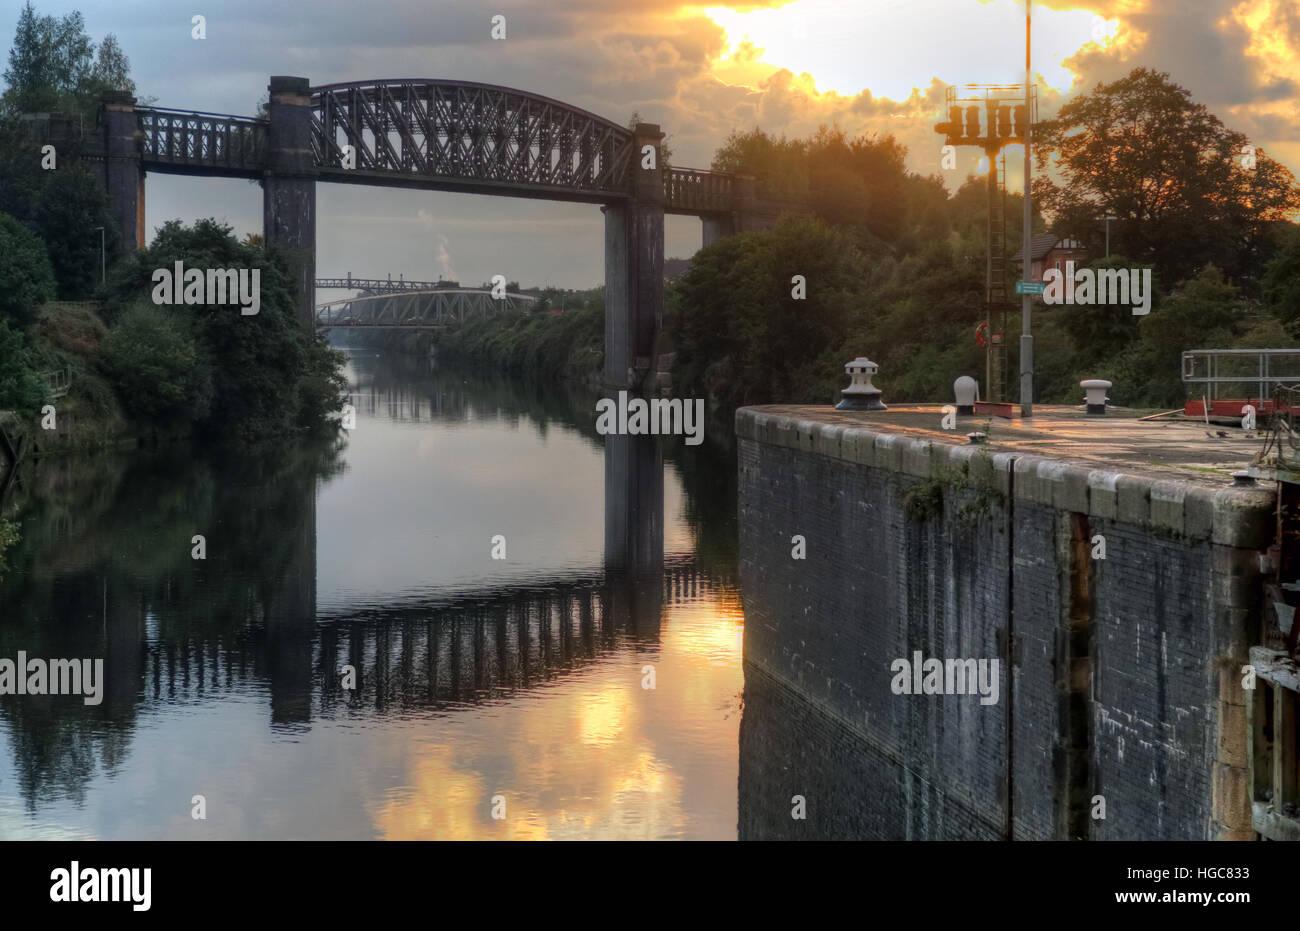 sun,set,sunset,evening,in,scenic,bridge,railway,trans-pennine,trail,transpennine,trail,water,reflection,WBC,cloud,sky,morning,lock,locks,London